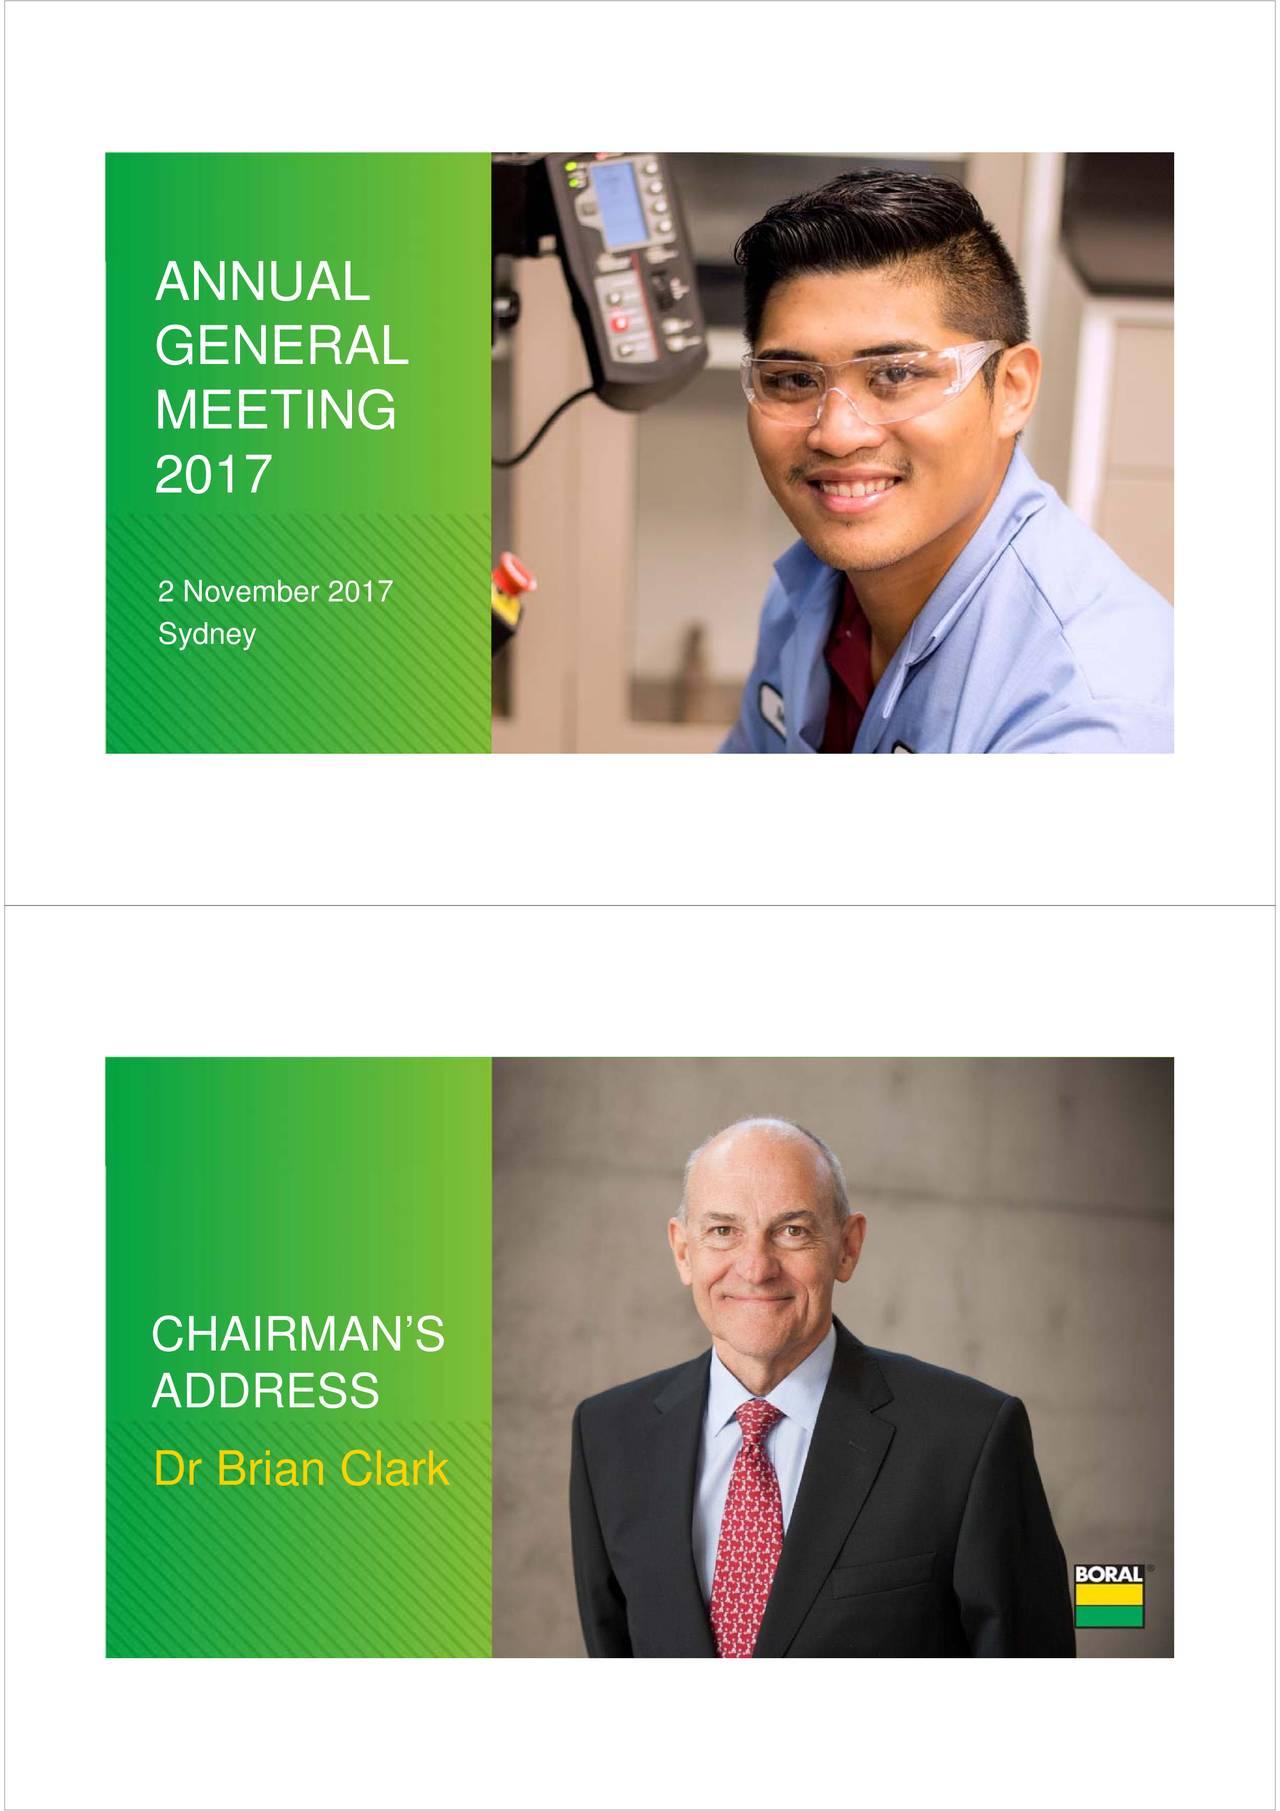 GENERAL MEETING 2017 2 November 2017 Sydney CHAIRMAN'S ADDRESS Dr Brian Clark